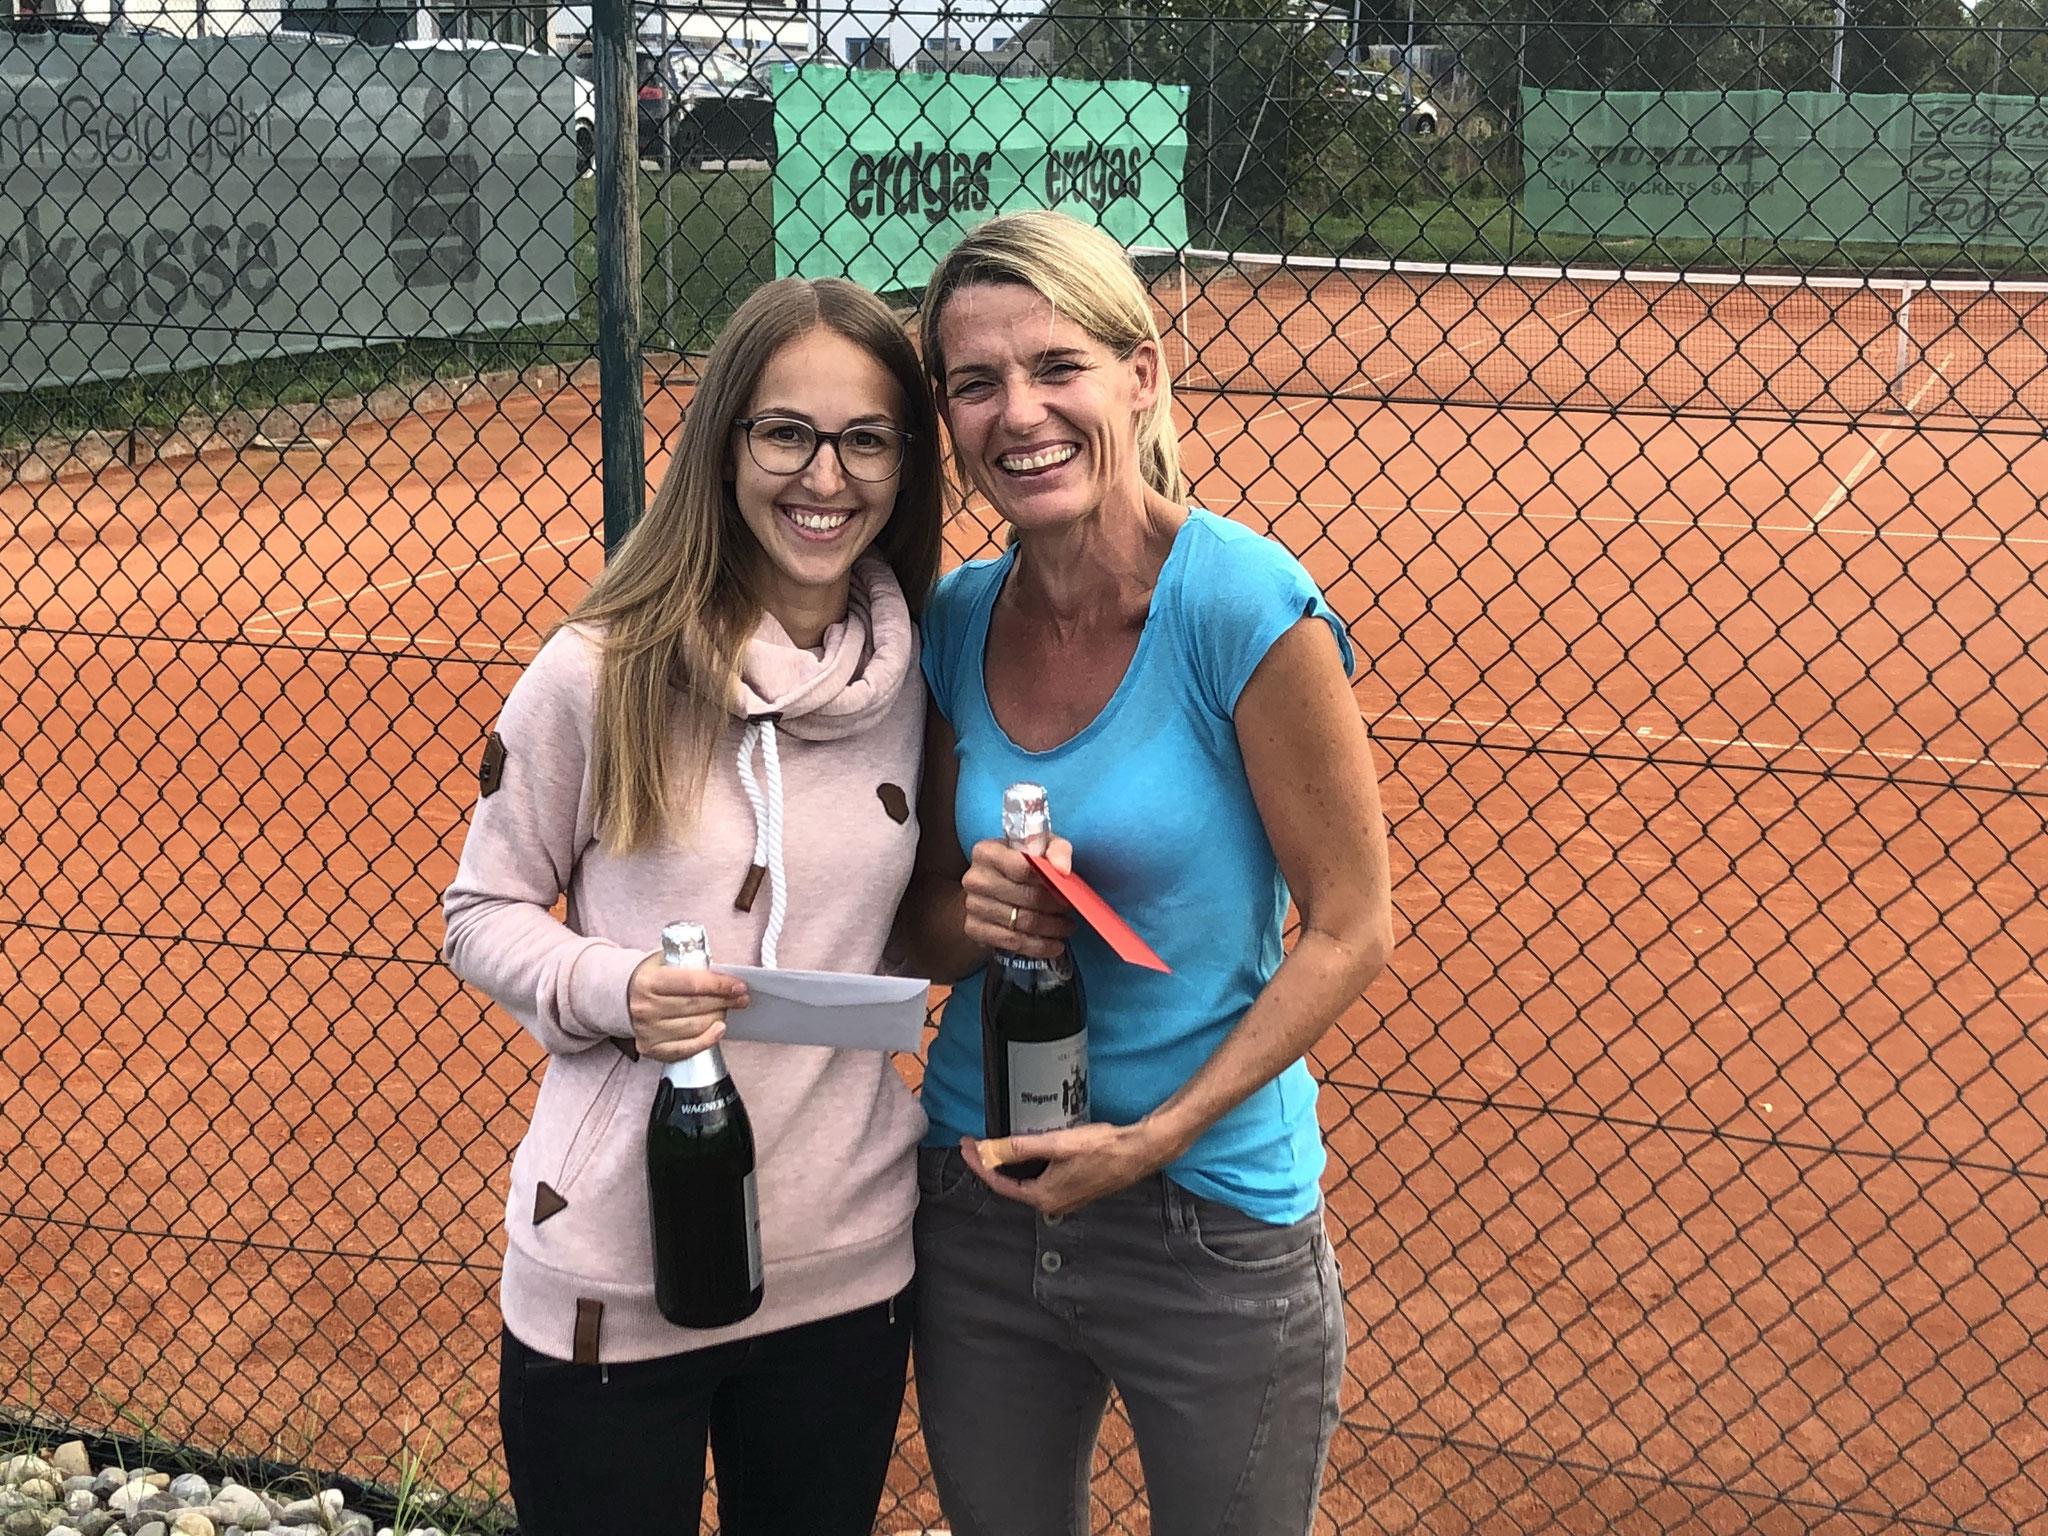 Damen - Rebecca Schüle und Siegerin Andrea Straub-Knissel